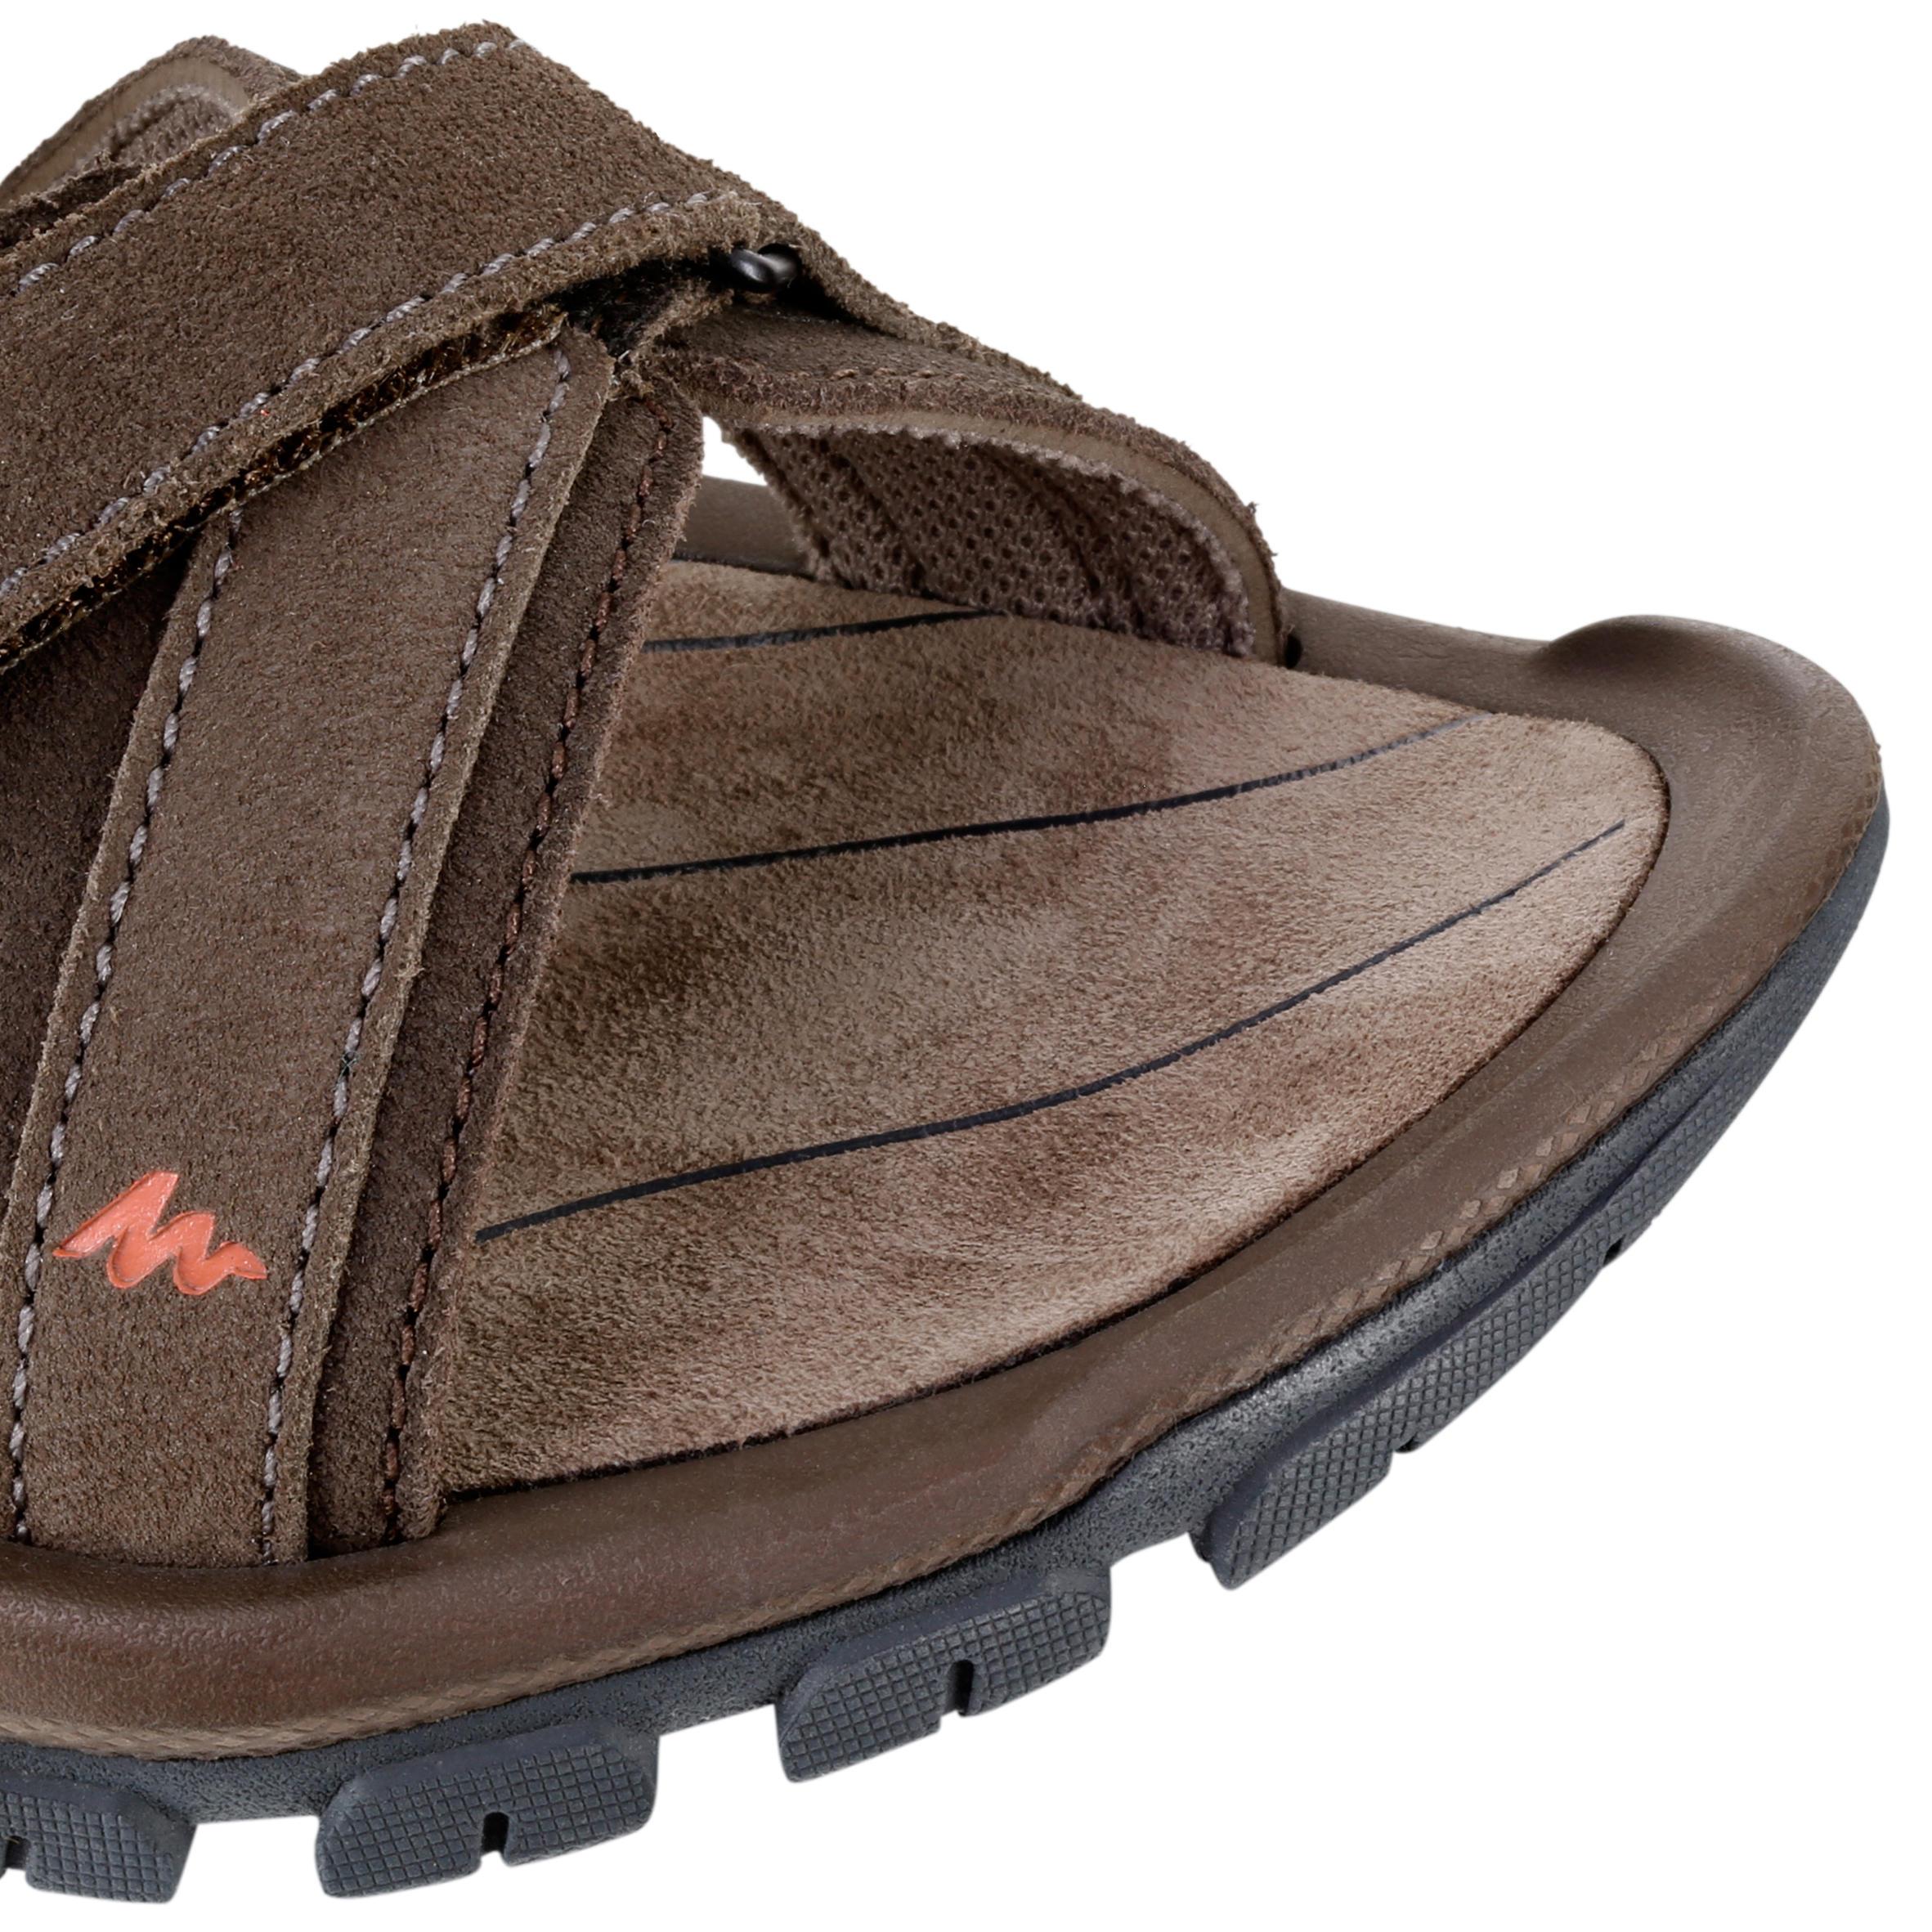 NH120 men's country walking sandals - brown